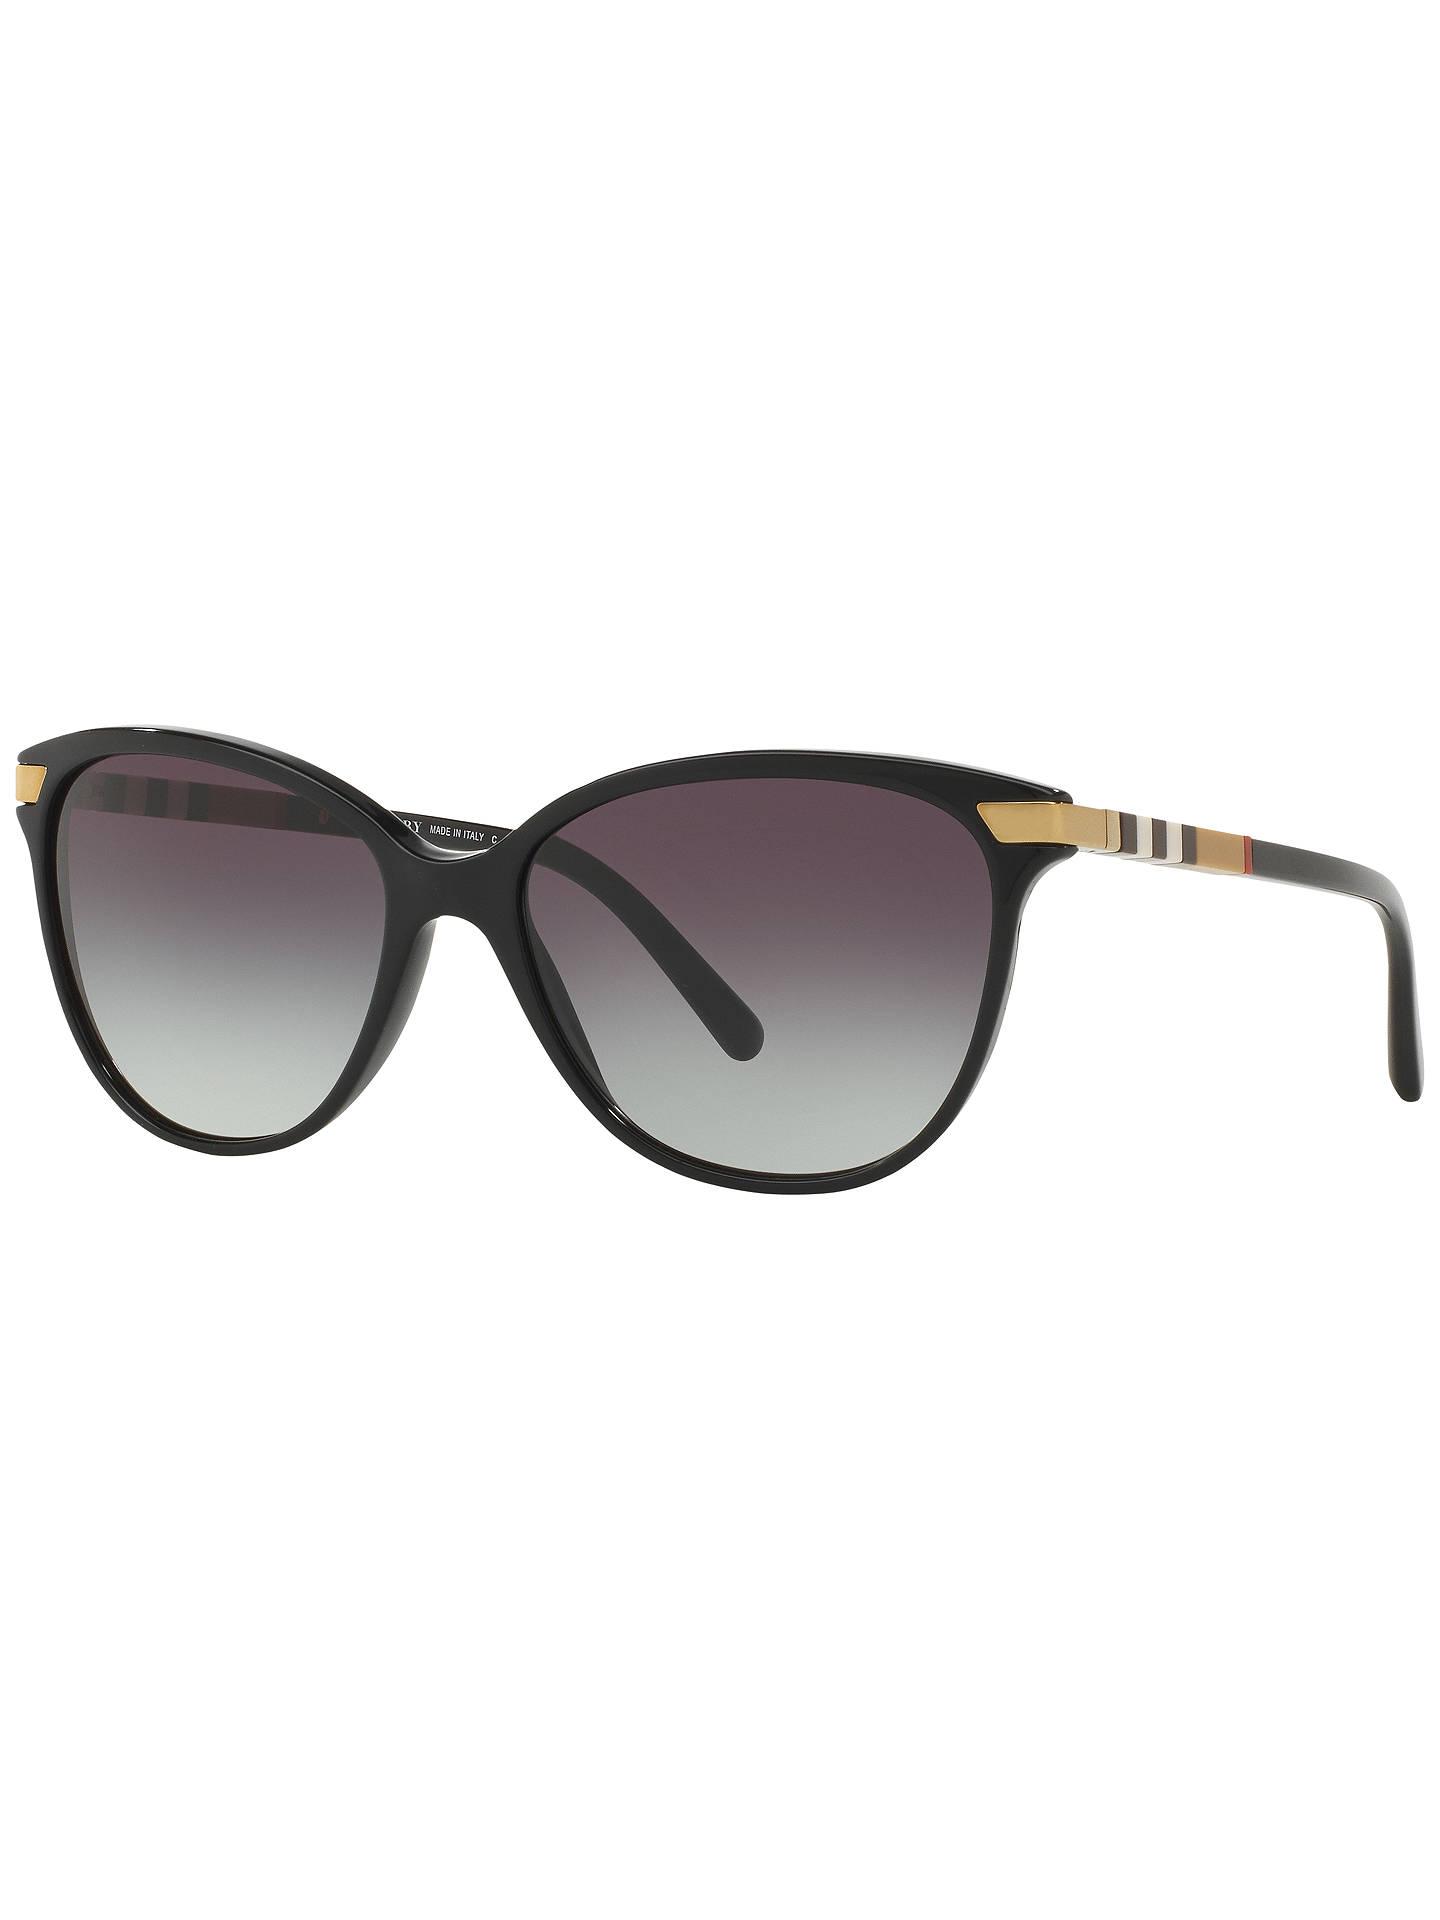 4010ee2b3f5a Buy Burberry BE4216 Cat s Eye Gradient Sunglasses